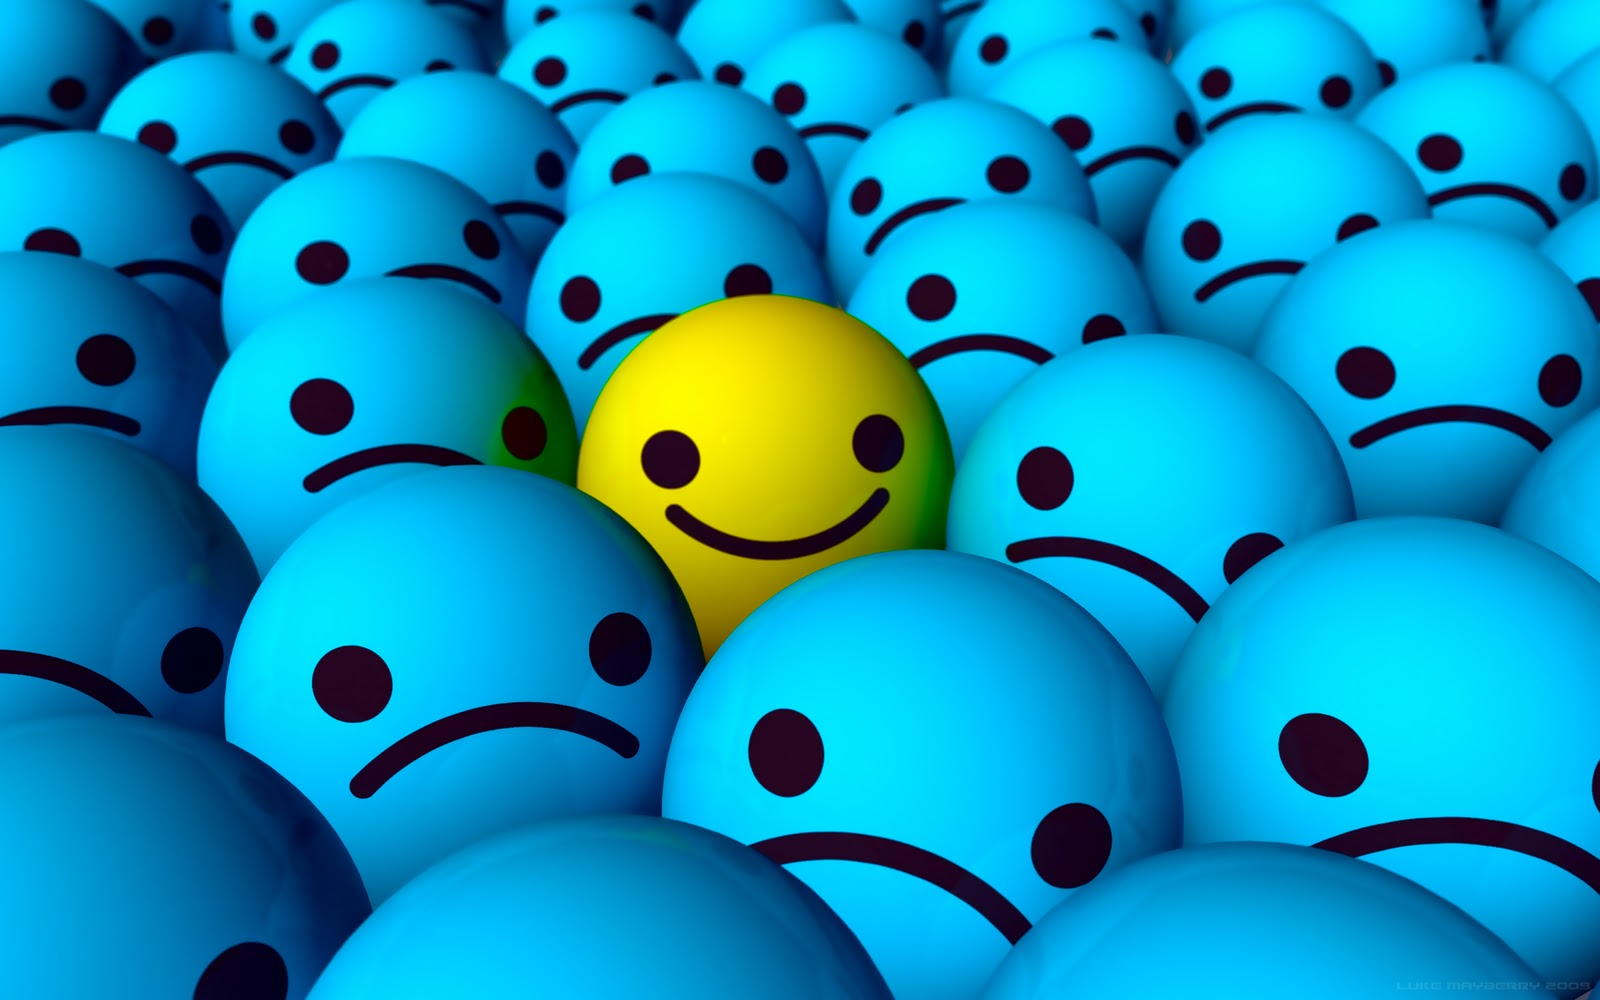 Emo Happy Smiley Wallpaper by Ixionxjpg 1600x1000